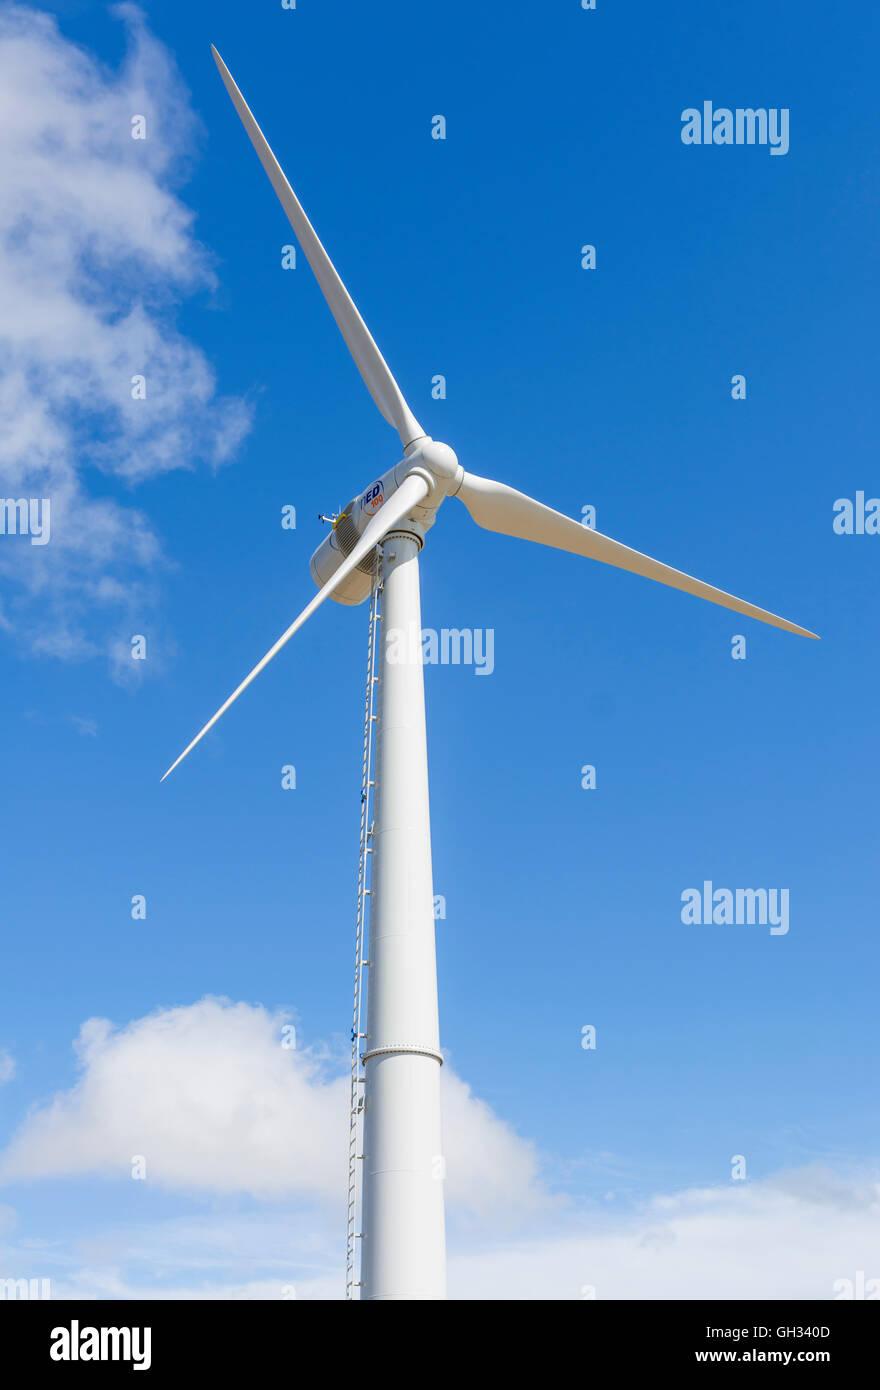 Wind turbine for generating electricity in Shoreham, West Sussex, England, UK. - Stock Image